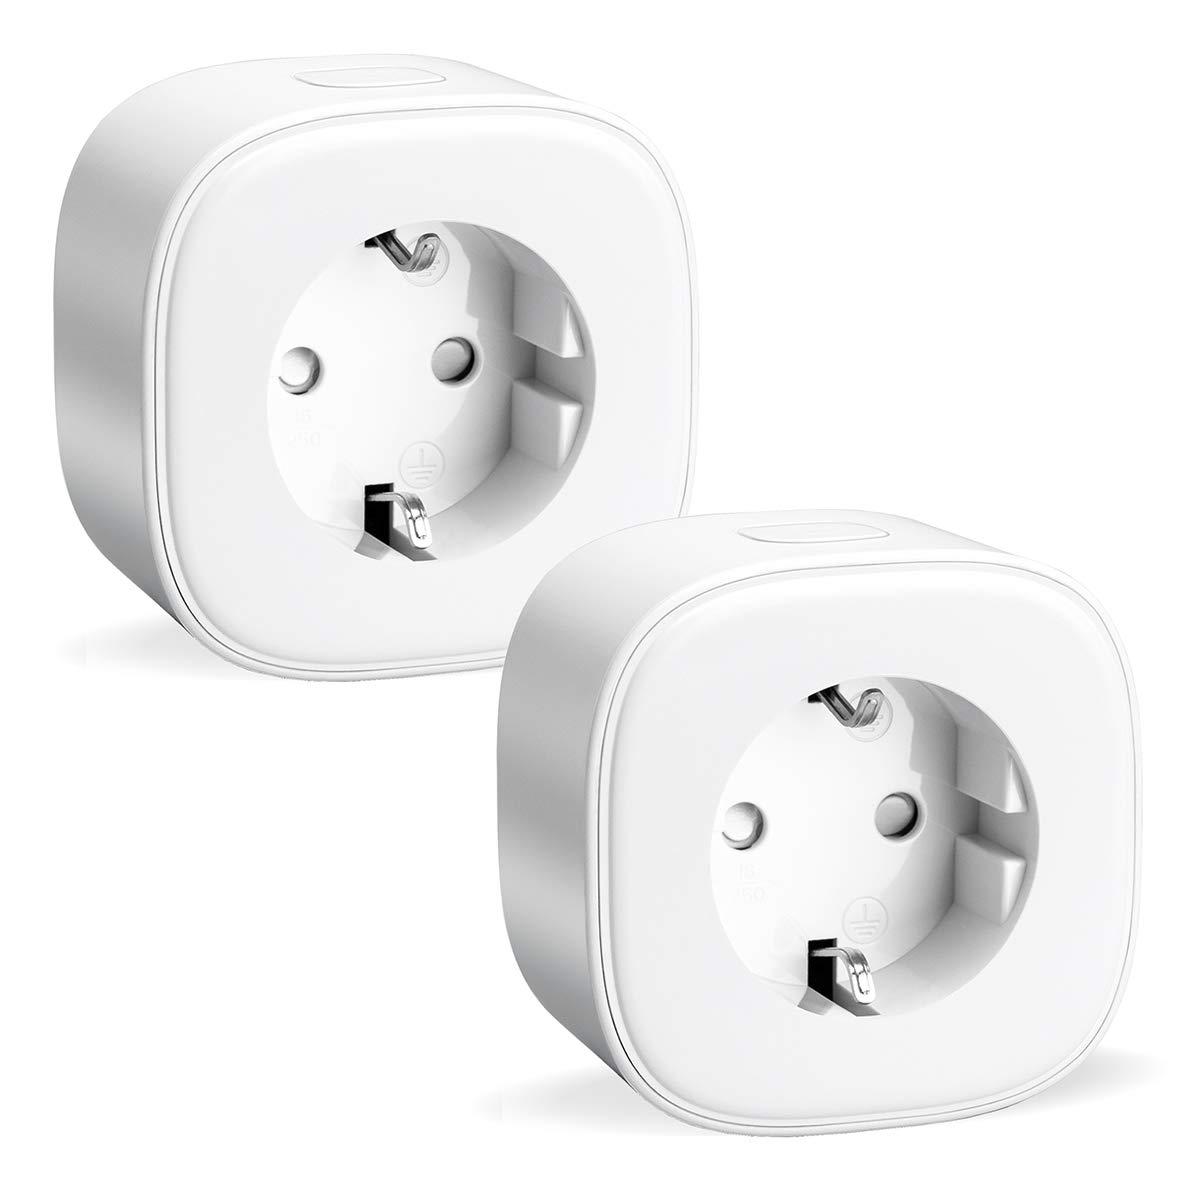 Pack de 2 enchufes inteligentes con Wi-Fi (16A 3680W) mide el consumo